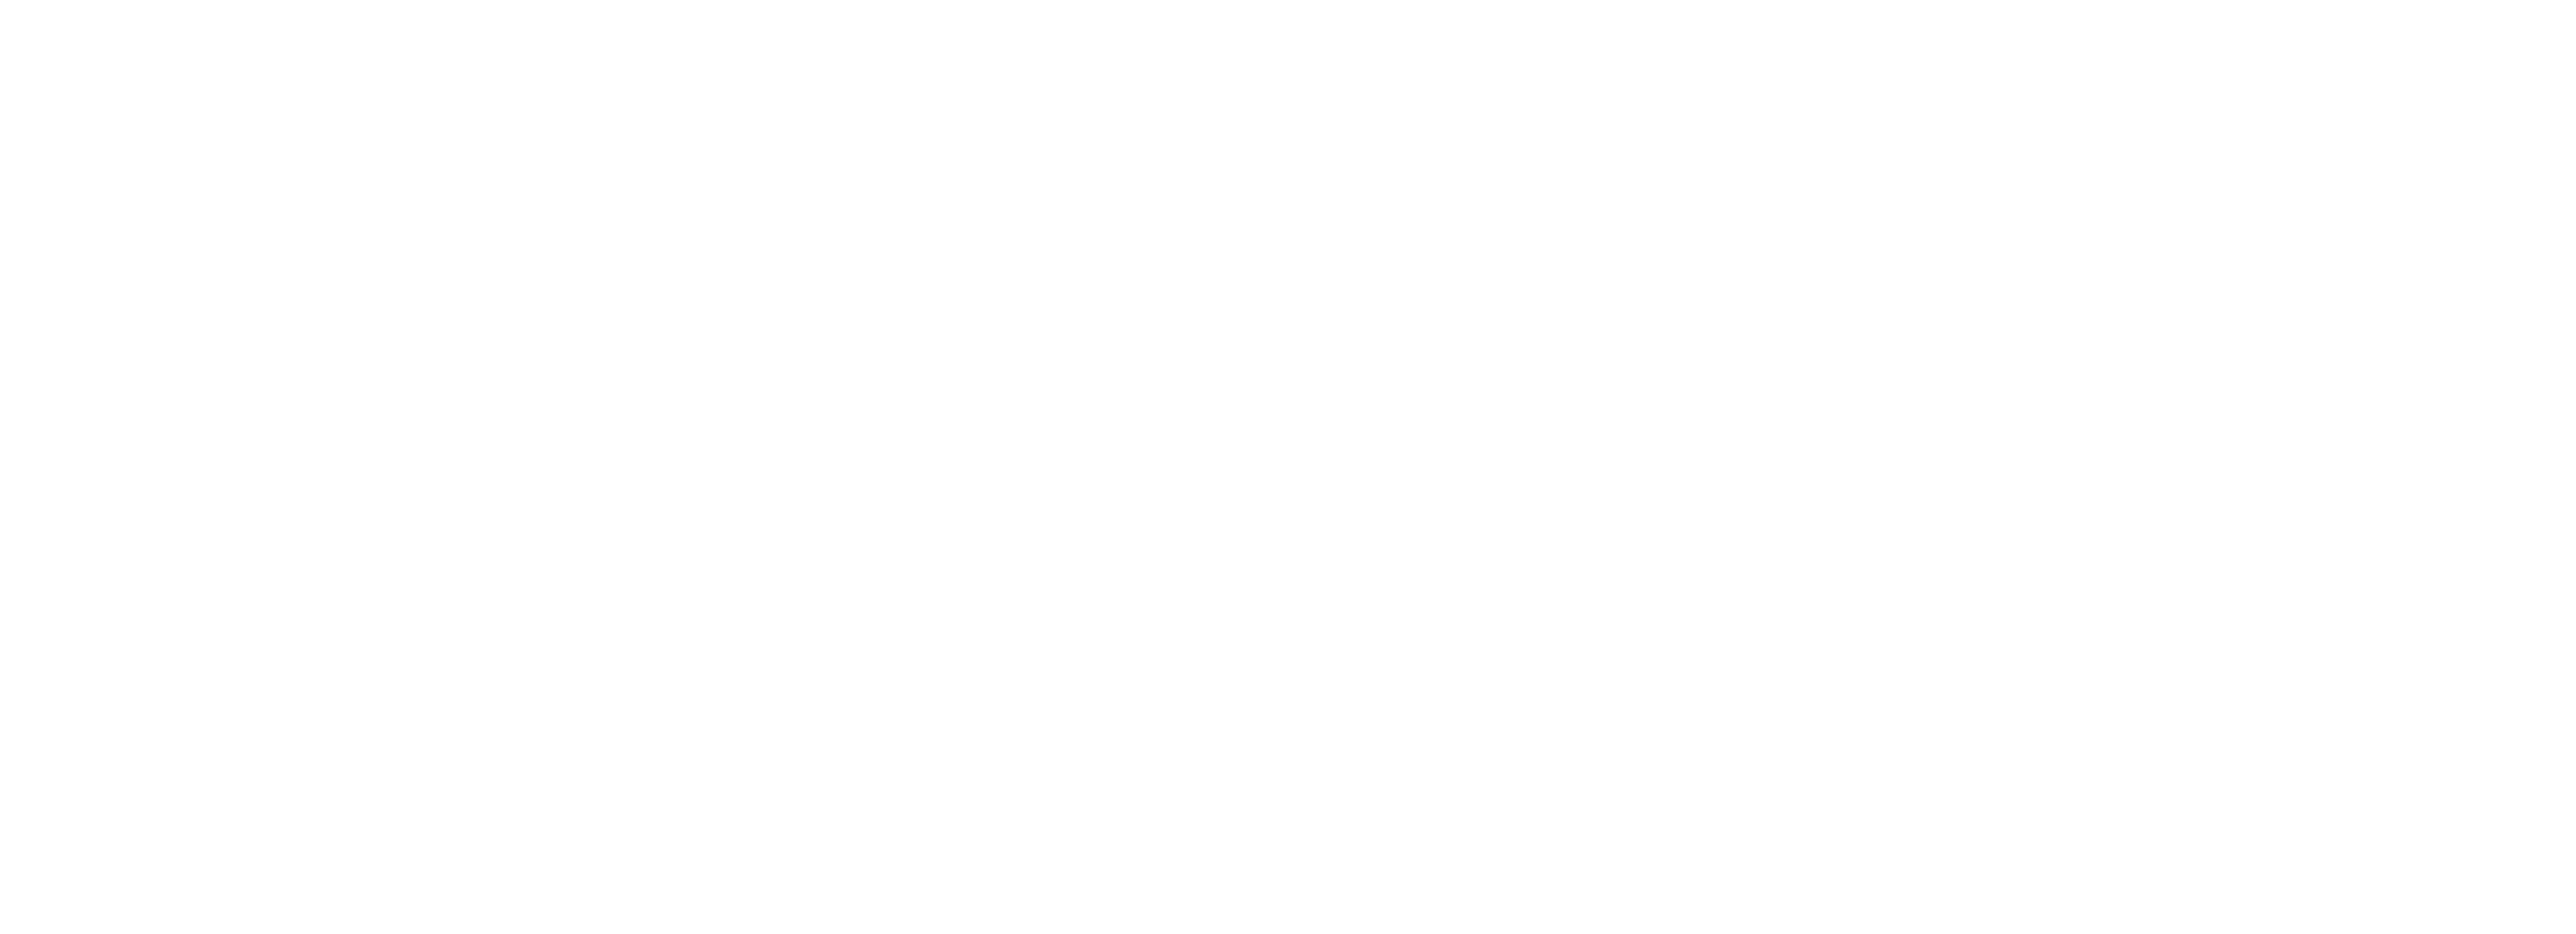 Texas elite logo 3 1 copy